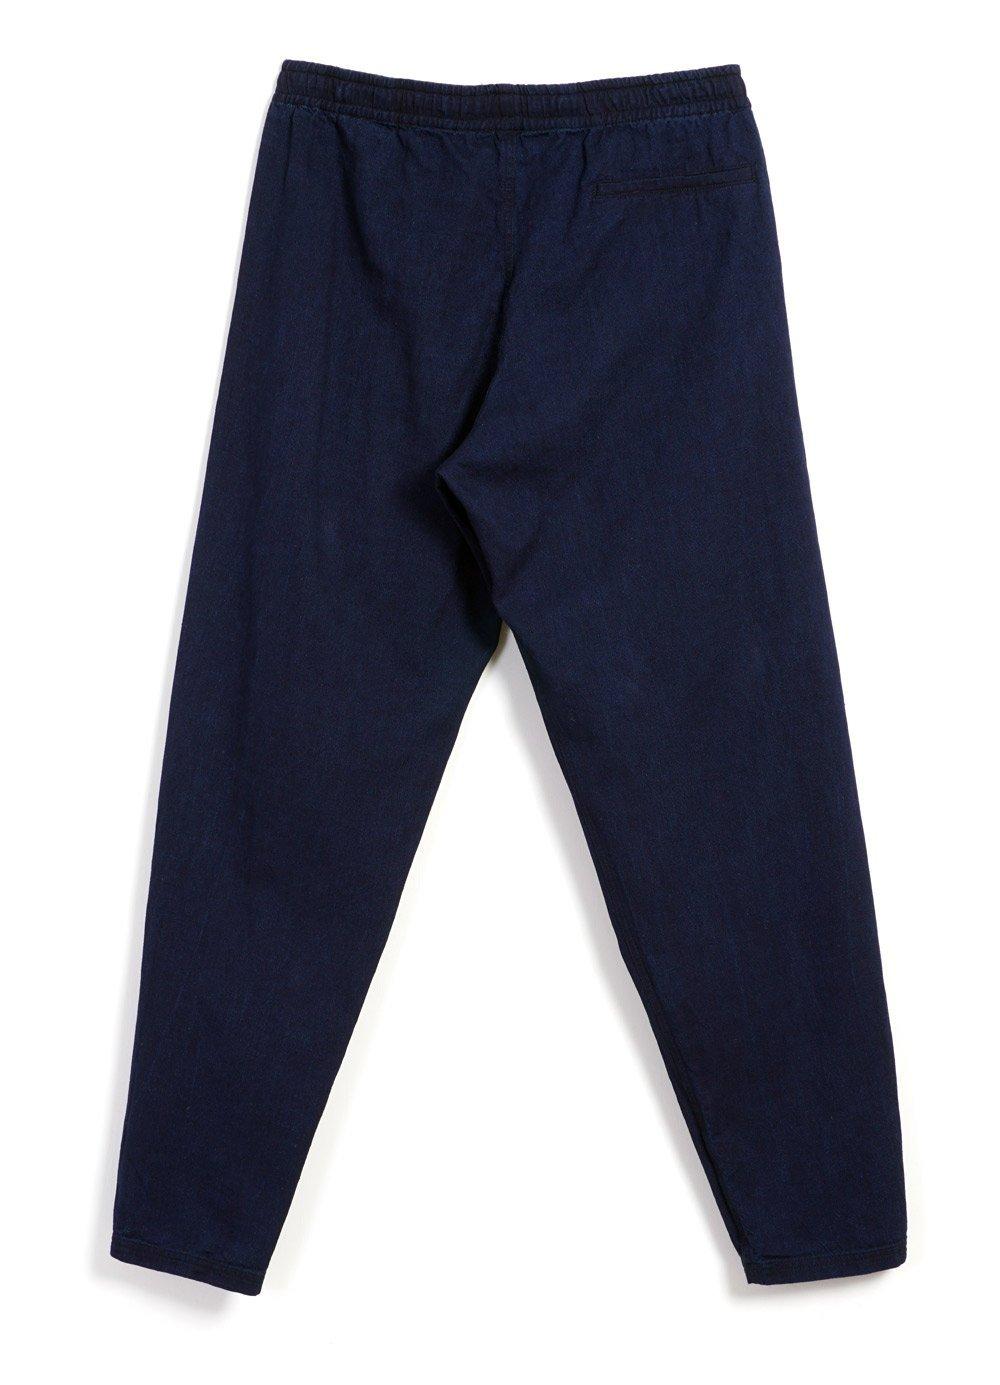 Hansen Garments JIM | Casual Drawstring Trousers | Indigo